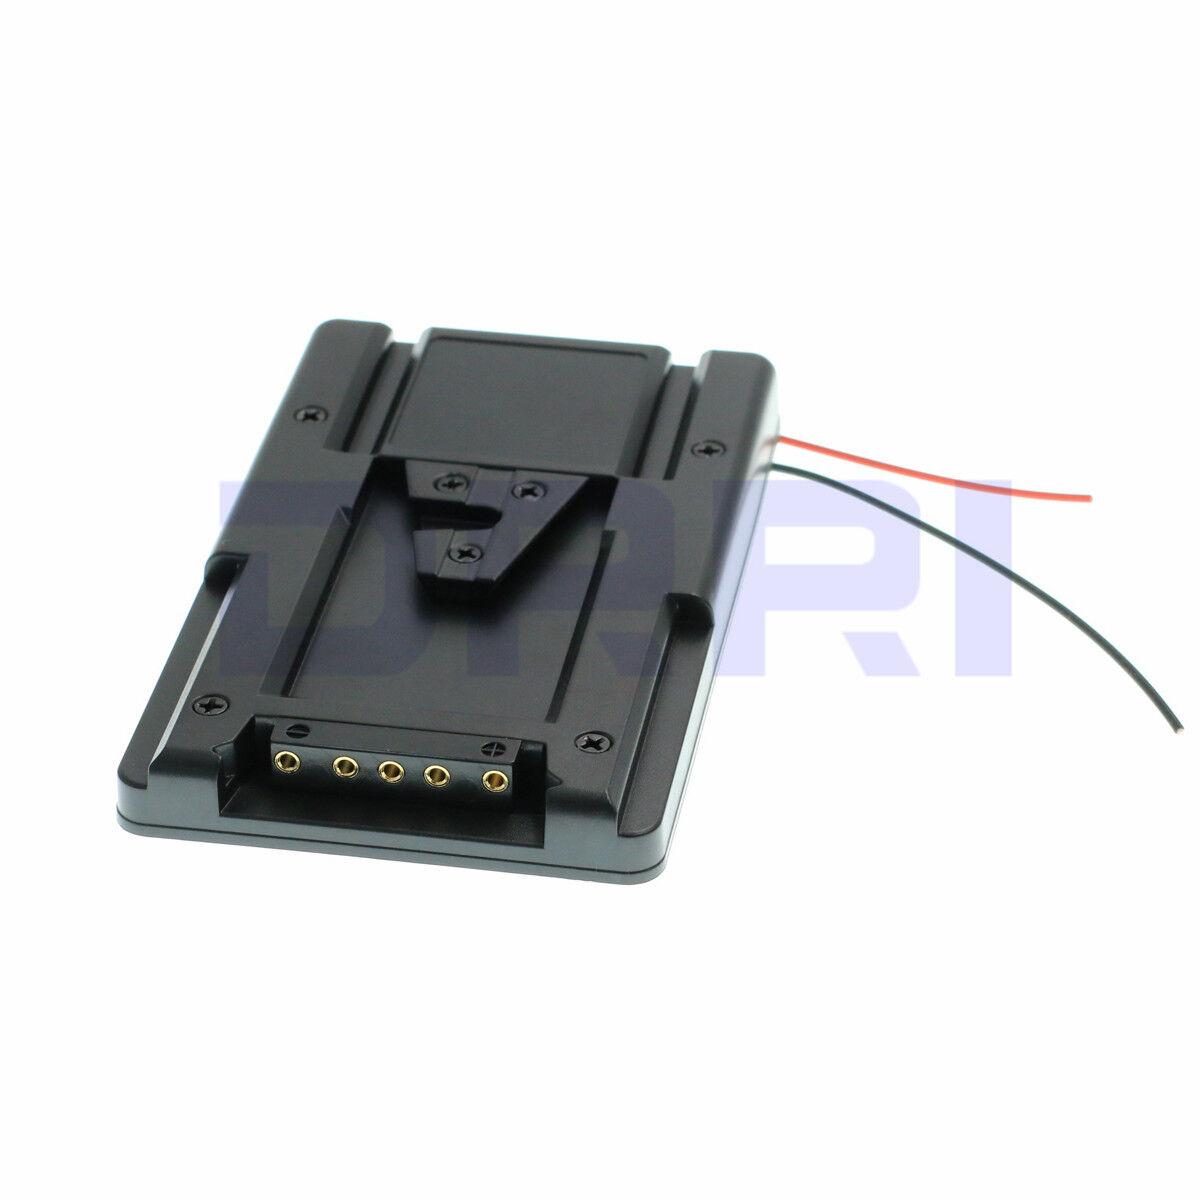 V-Lock V-mount Battery Adapter Plate Converter fr Sony HDV DSLR Rig Supply S-GP